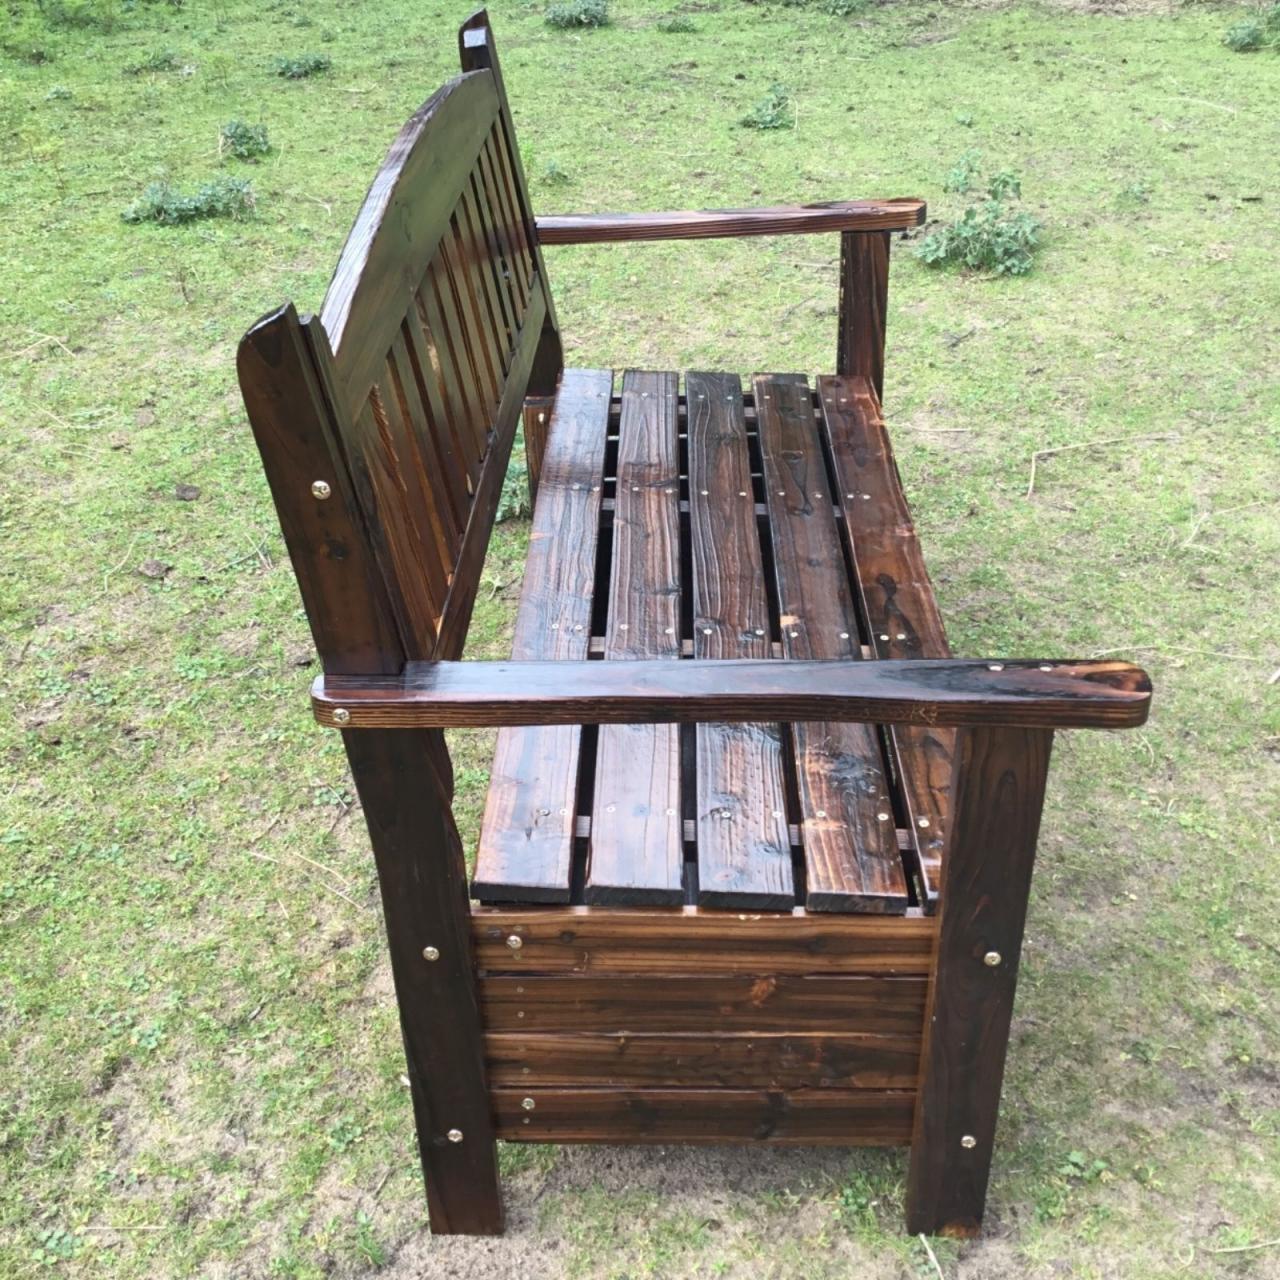 wooden garden storage box timber bench chair outdoor. Black Bedroom Furniture Sets. Home Design Ideas